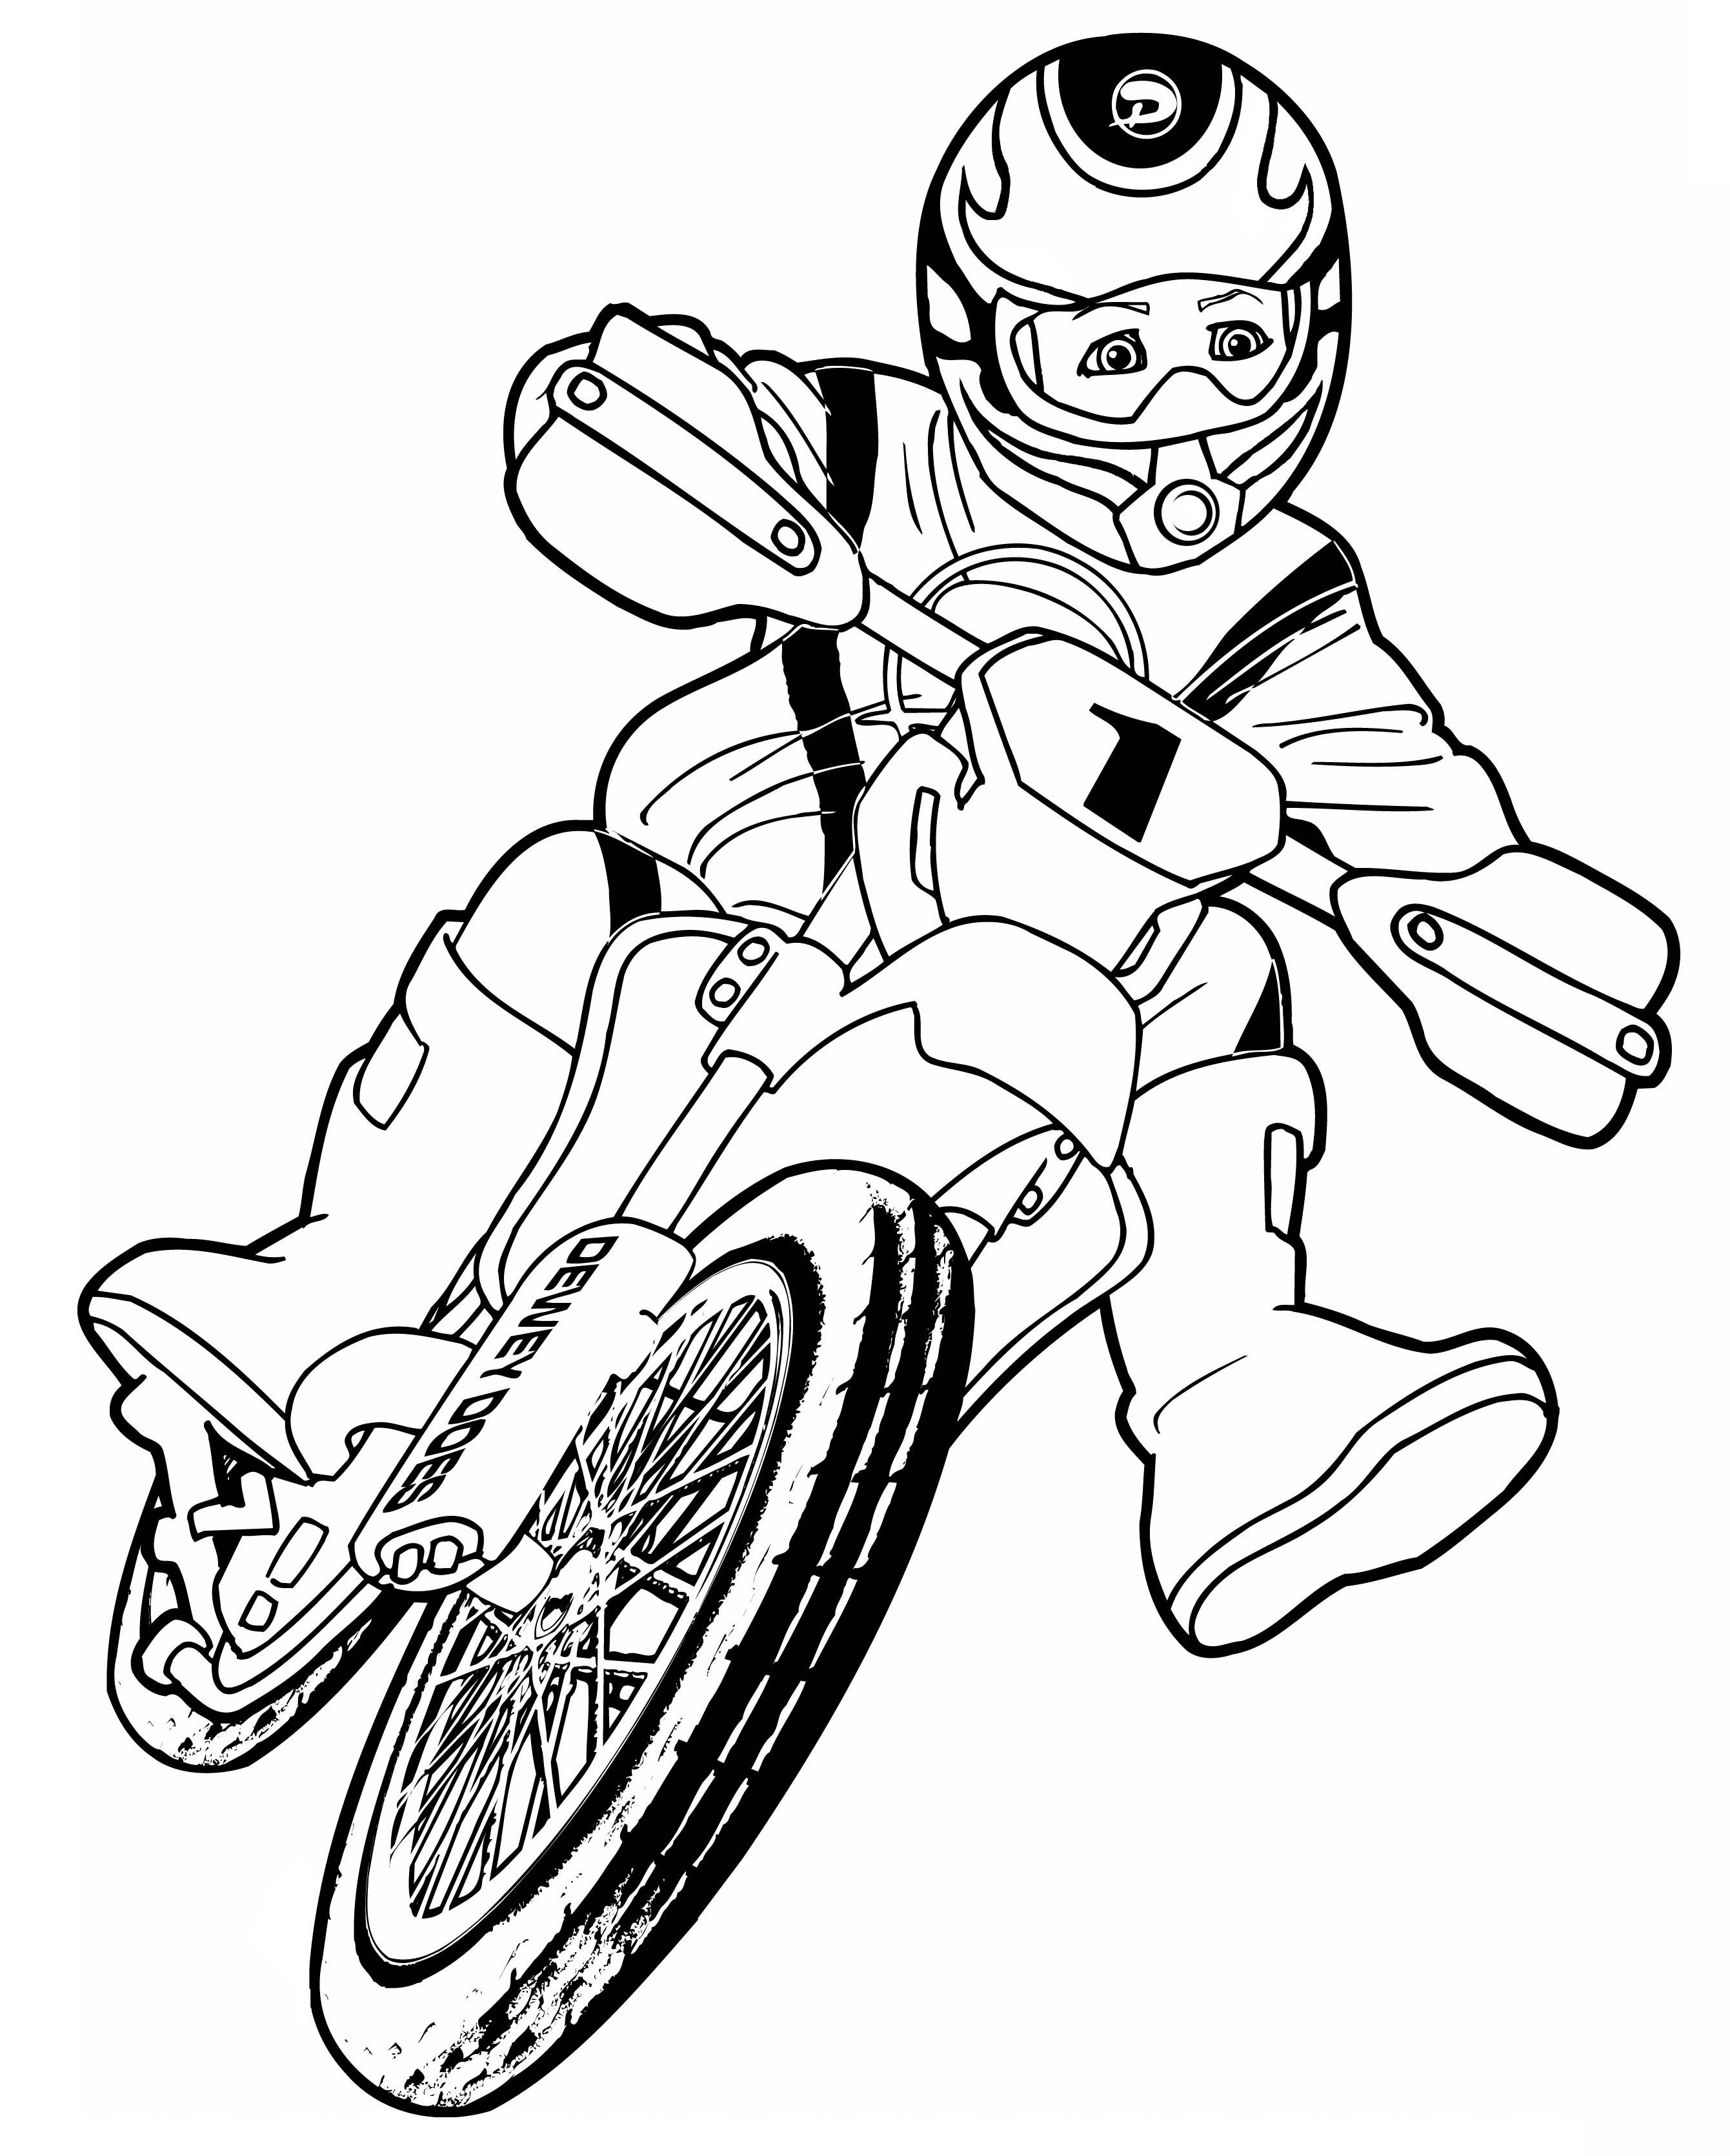 Dessin Coloriage motocross a colorier